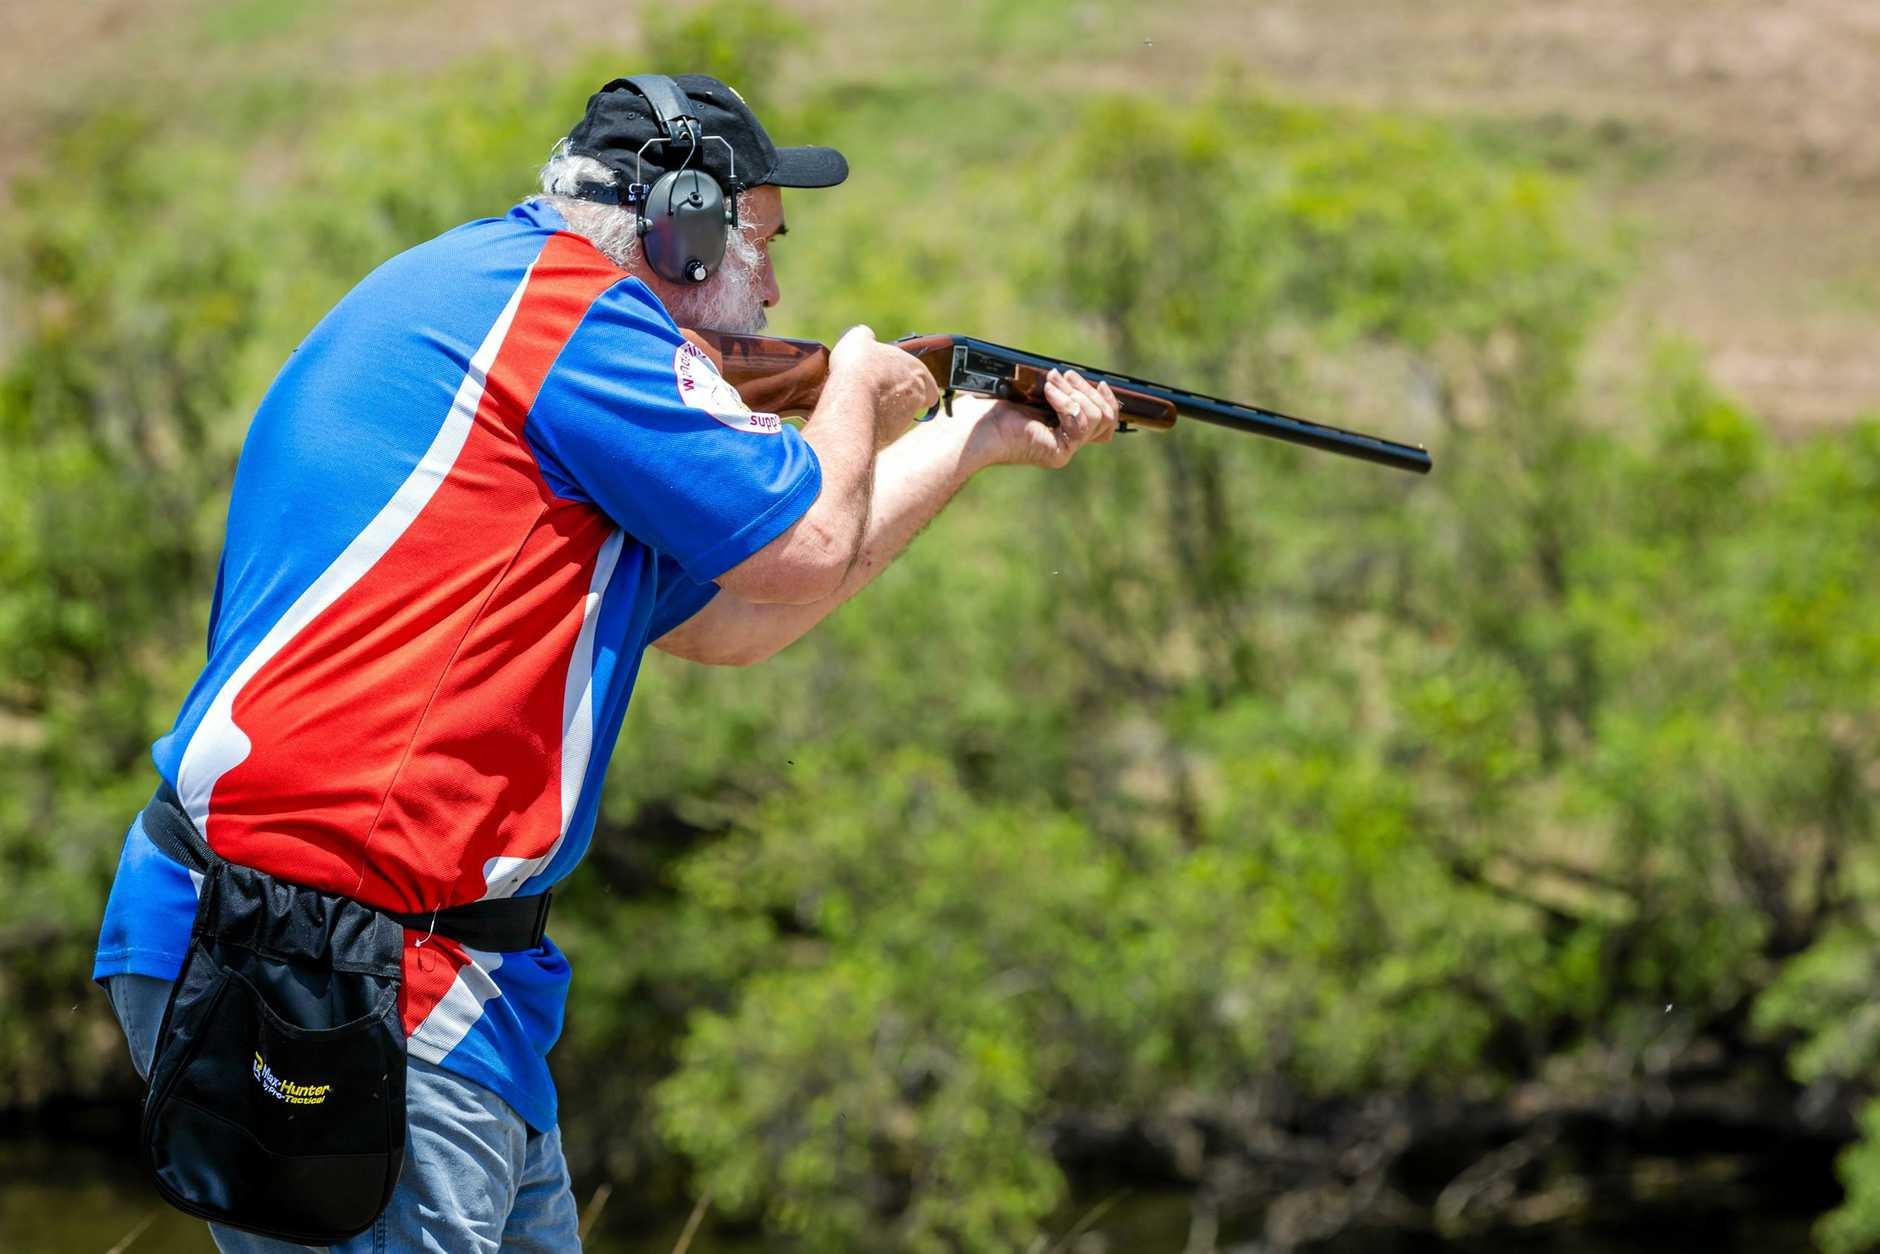 Shooting Clays, Ron Owen Gympie